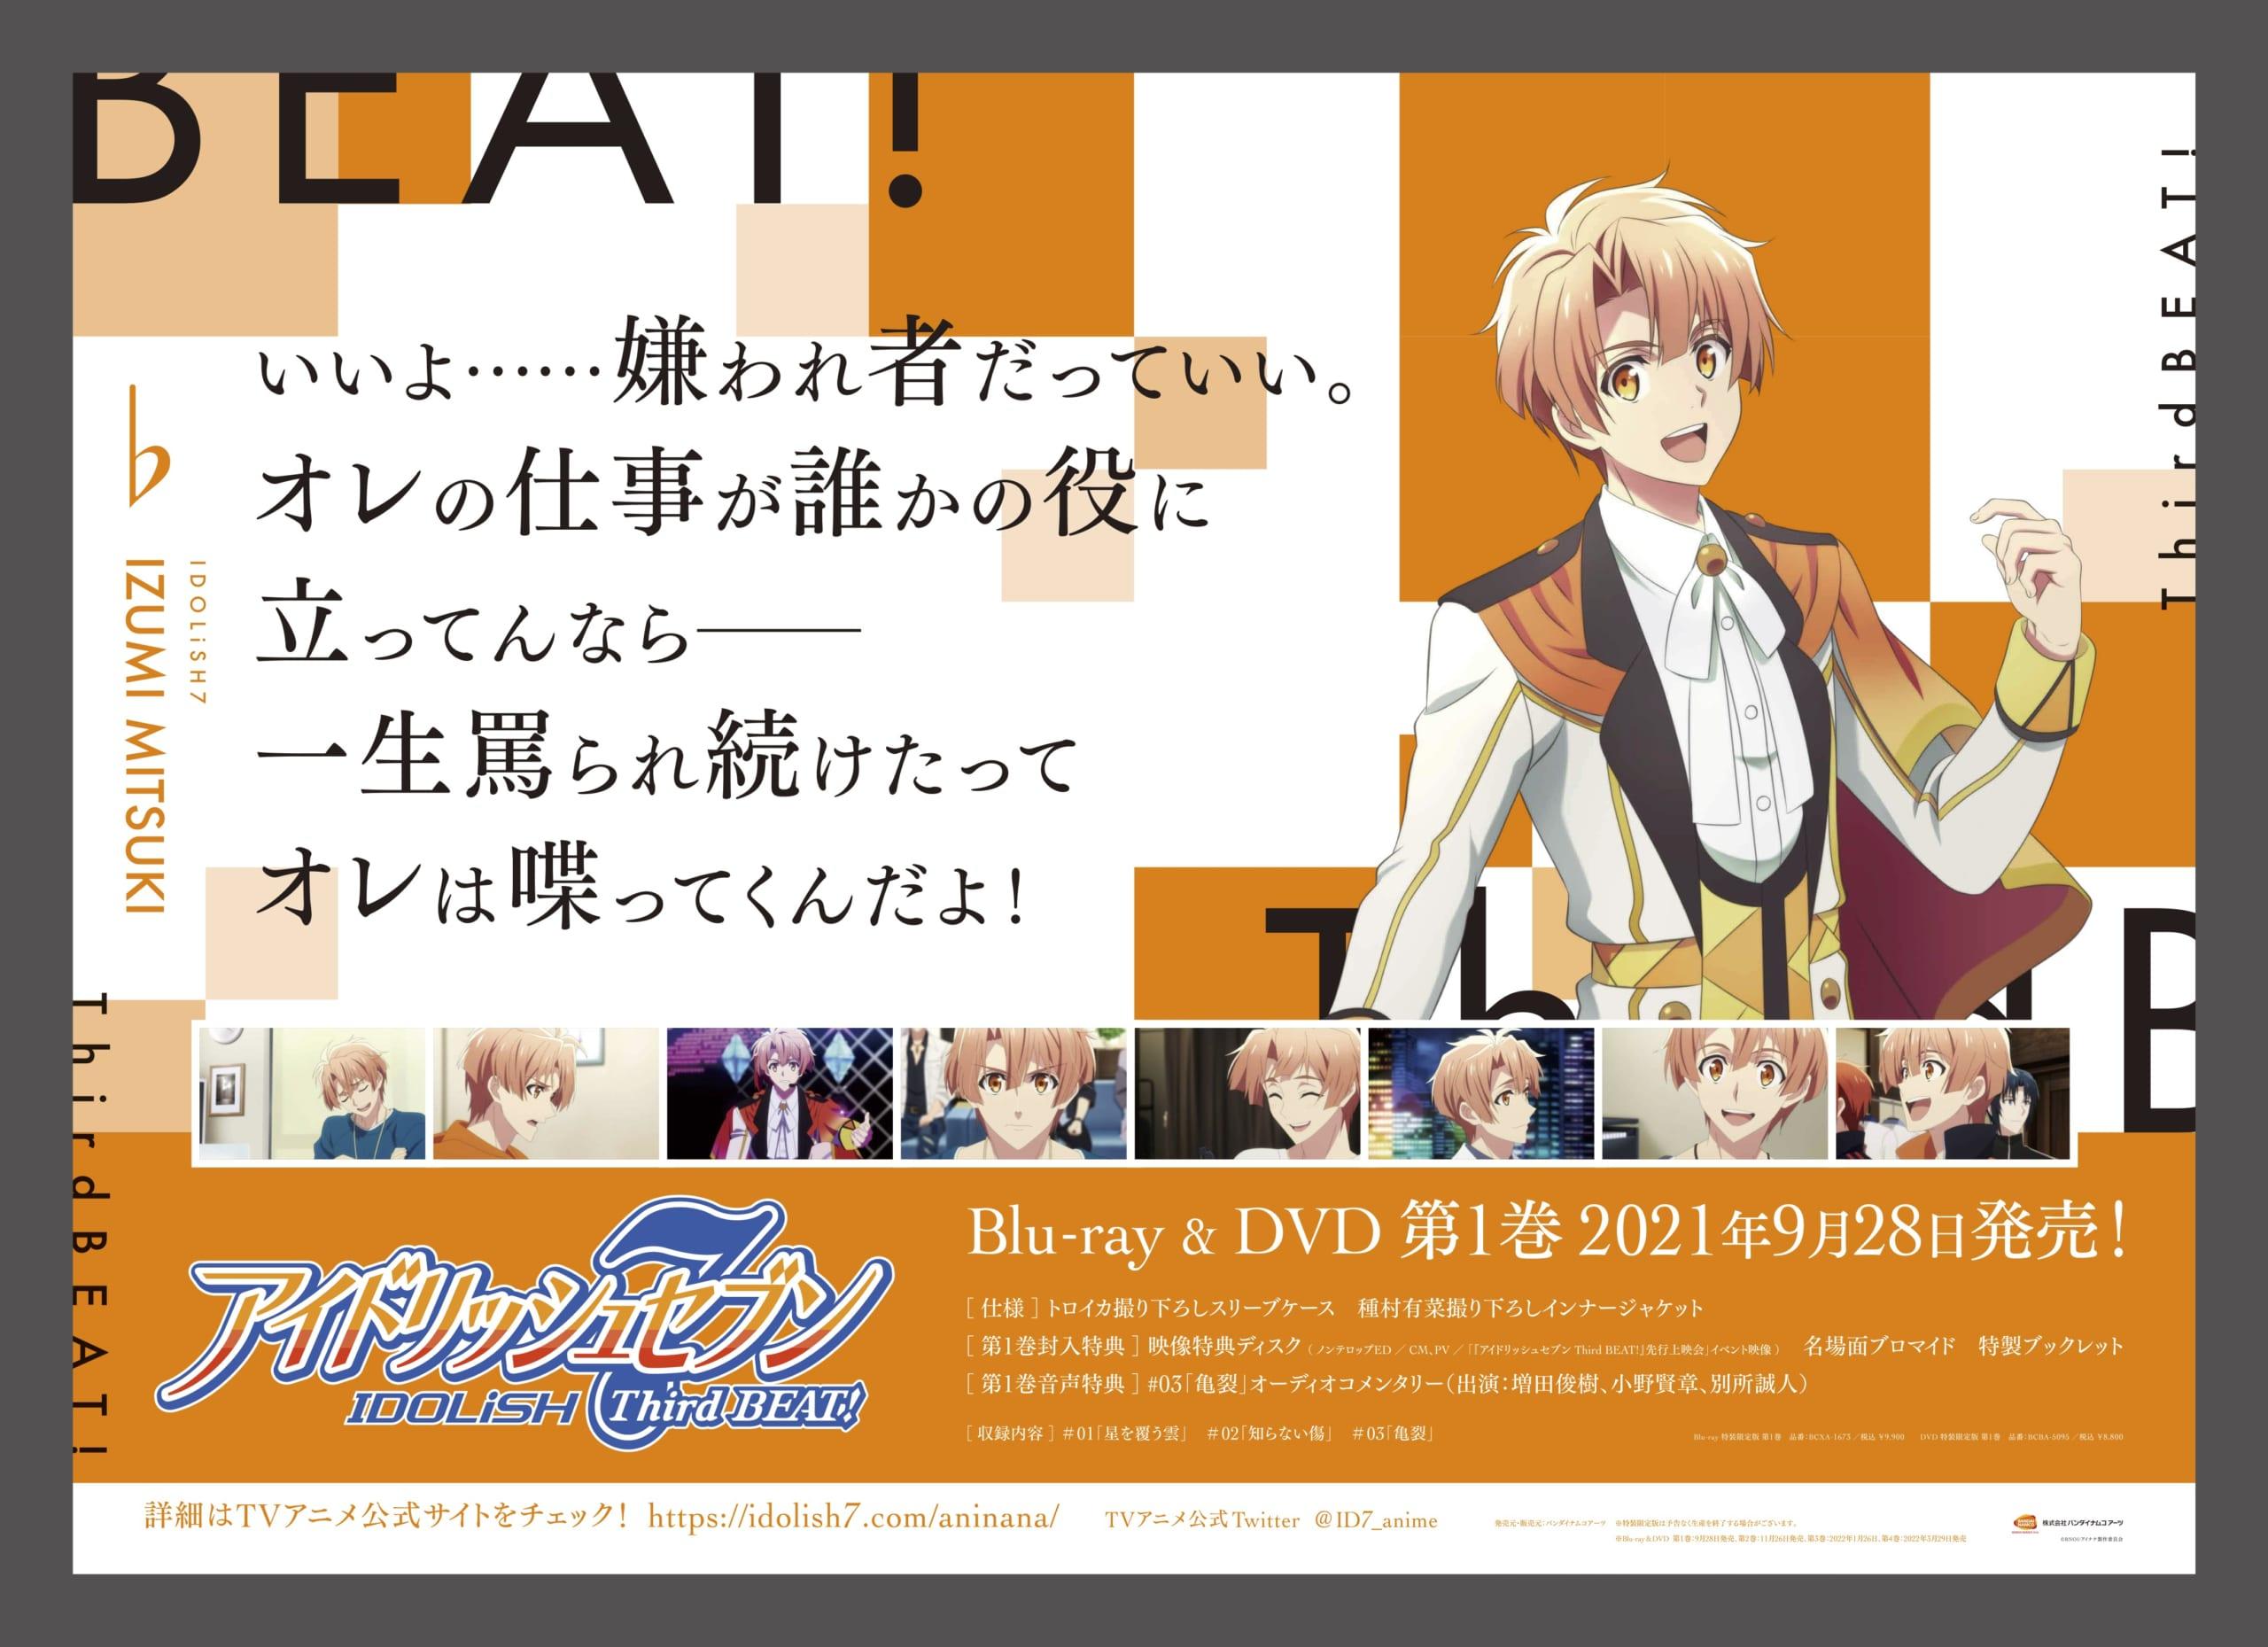 TVアニメ「アイドリッシュセブン Third BEAT!」駅広告和泉三月